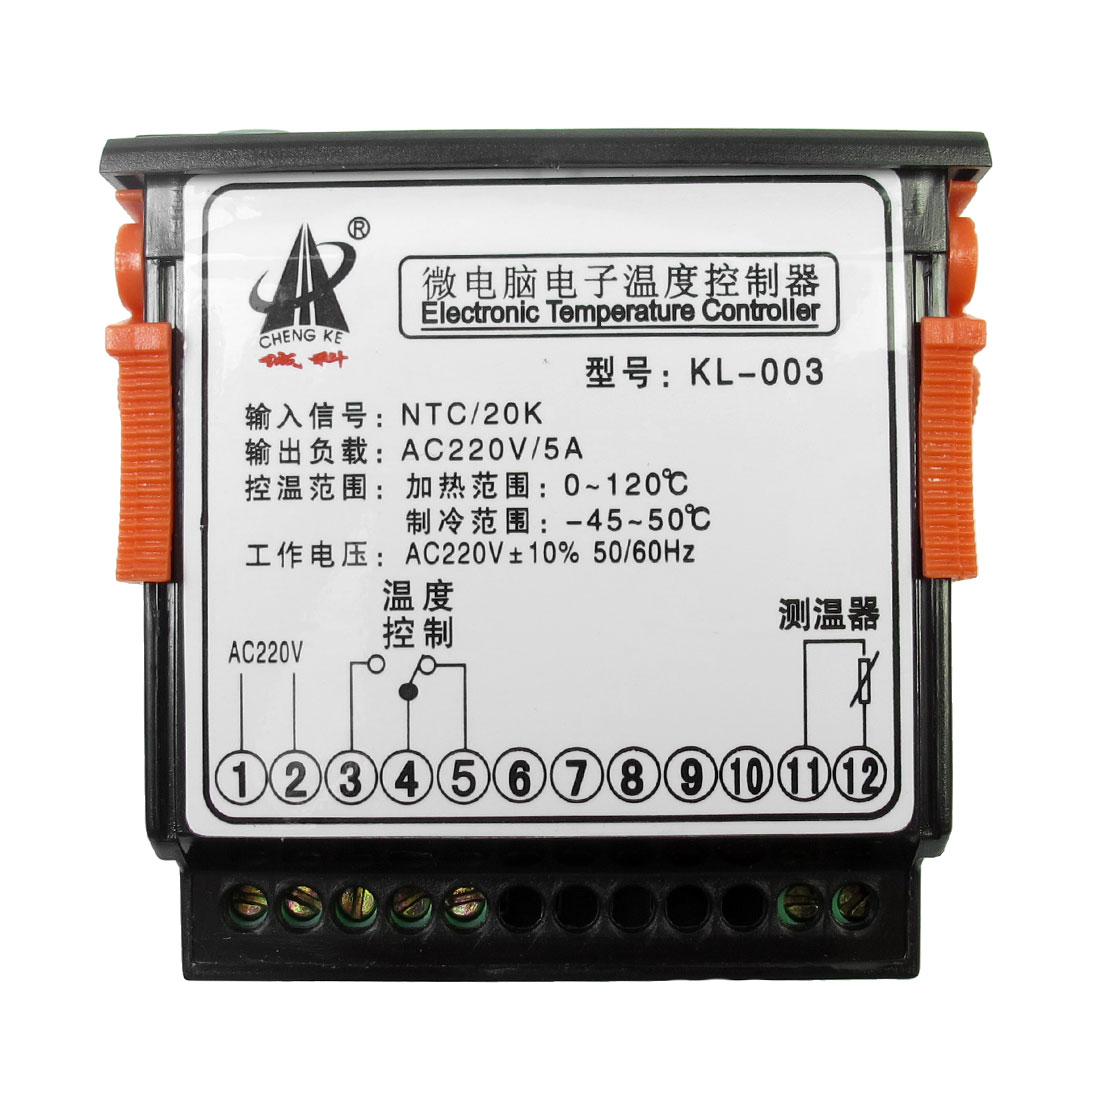 AC 220V Digital Thermostat Temperature Controller KL 003 w Sensor Cable